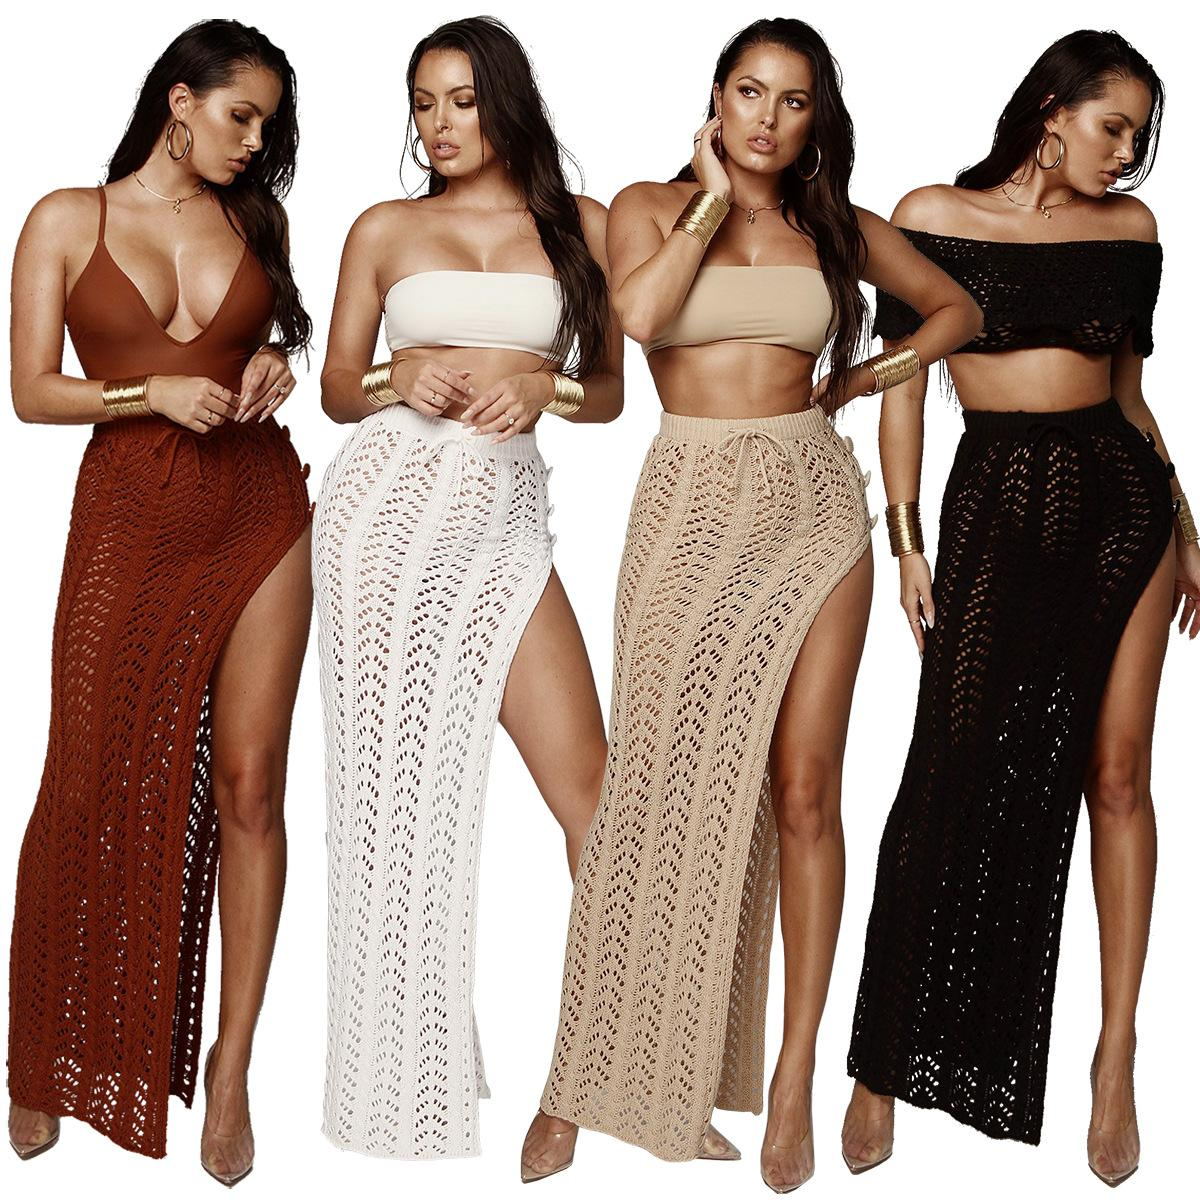 Mujeres Sexy Suéter Faldas Maxi Sólido Lace Up Plaid Hollow Cintura alta Side Split Falda Beach Bikini Cover Up Blanco Negro Rojo Light Tan Color